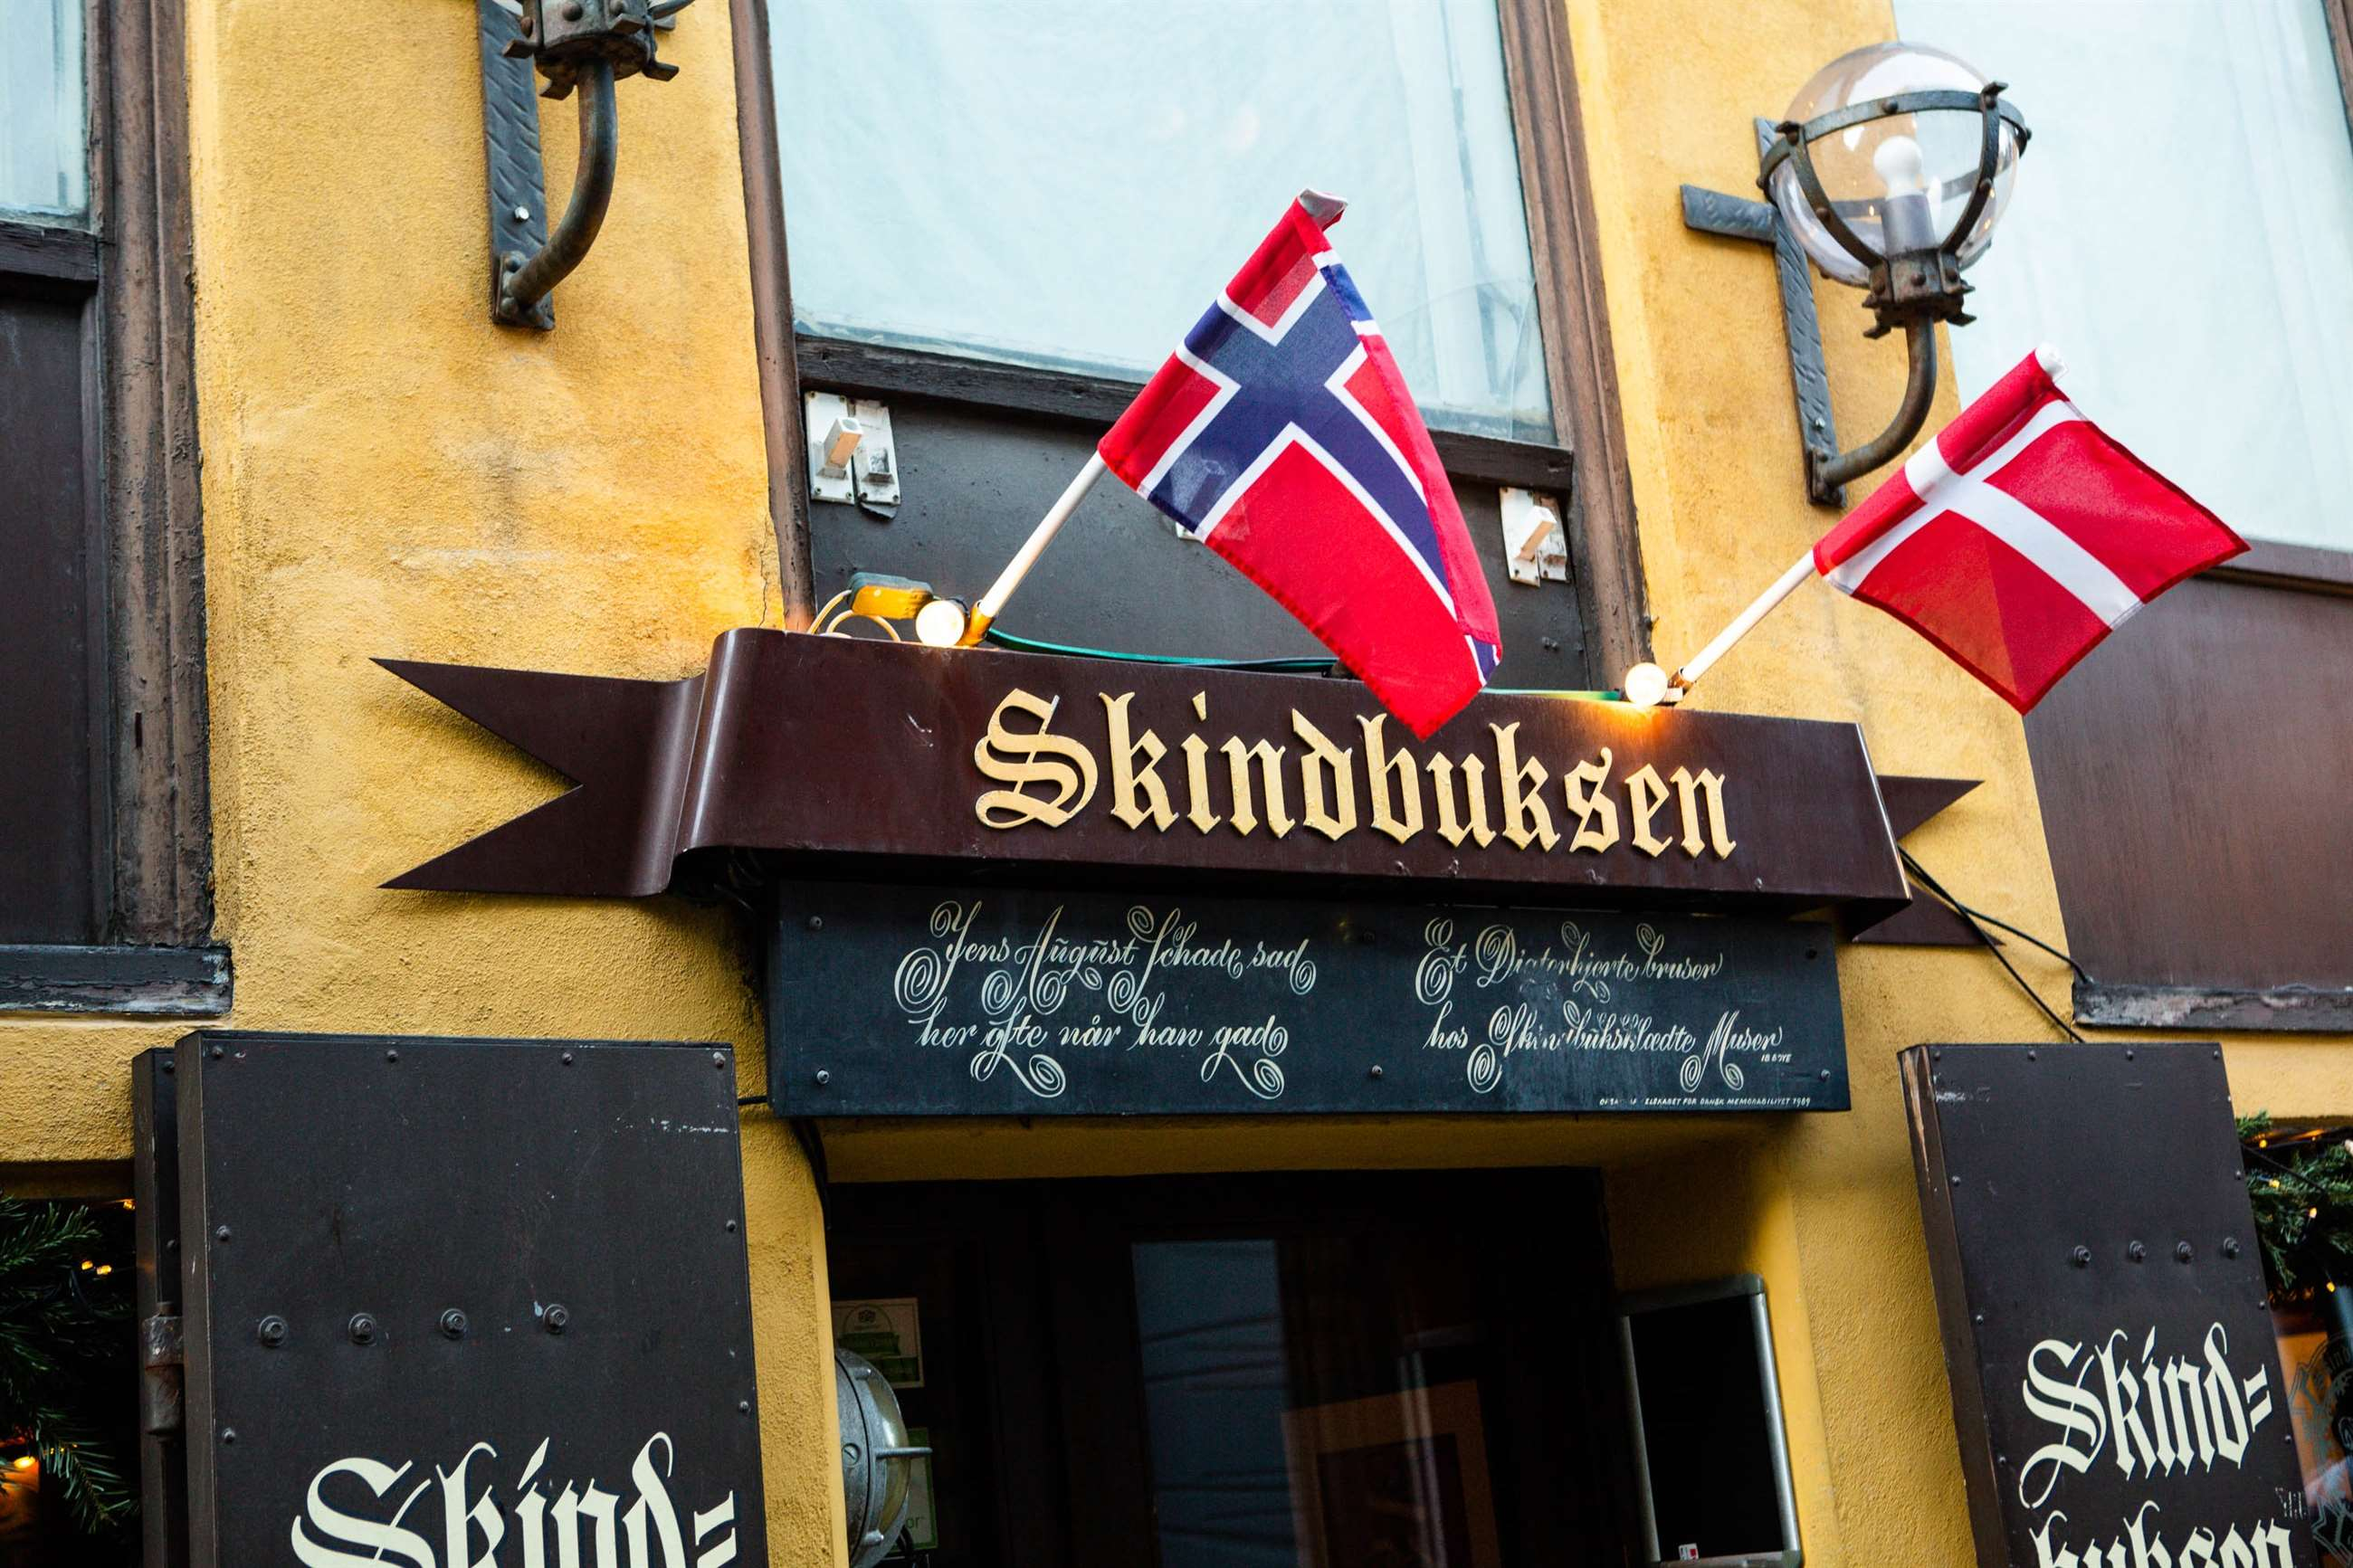 Skindbuksens facade